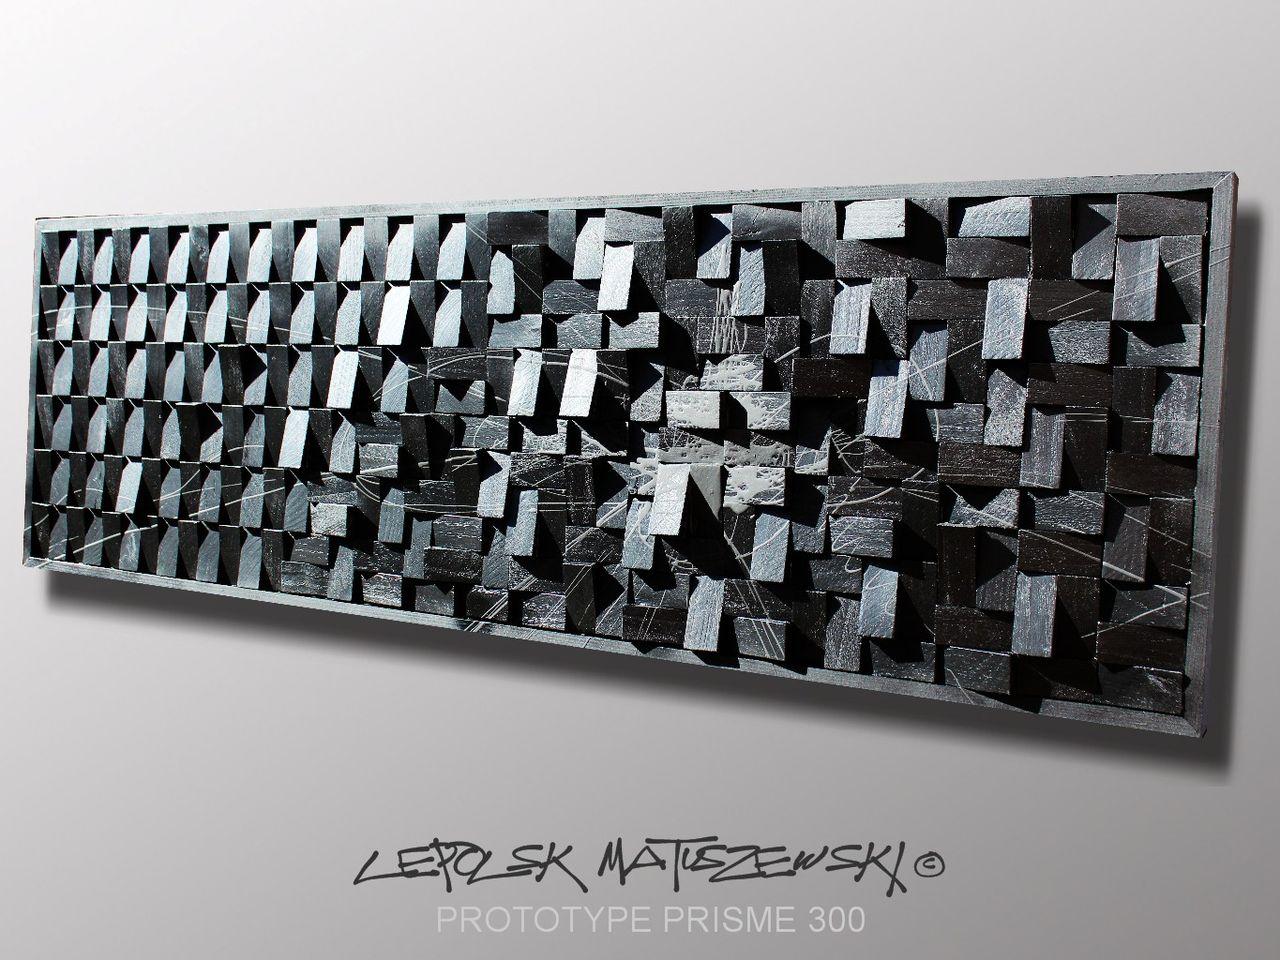 MK  Lepolsk Matuszewski PROTOTYPE PRISME 300   Expressionnisme abstrait contemporain